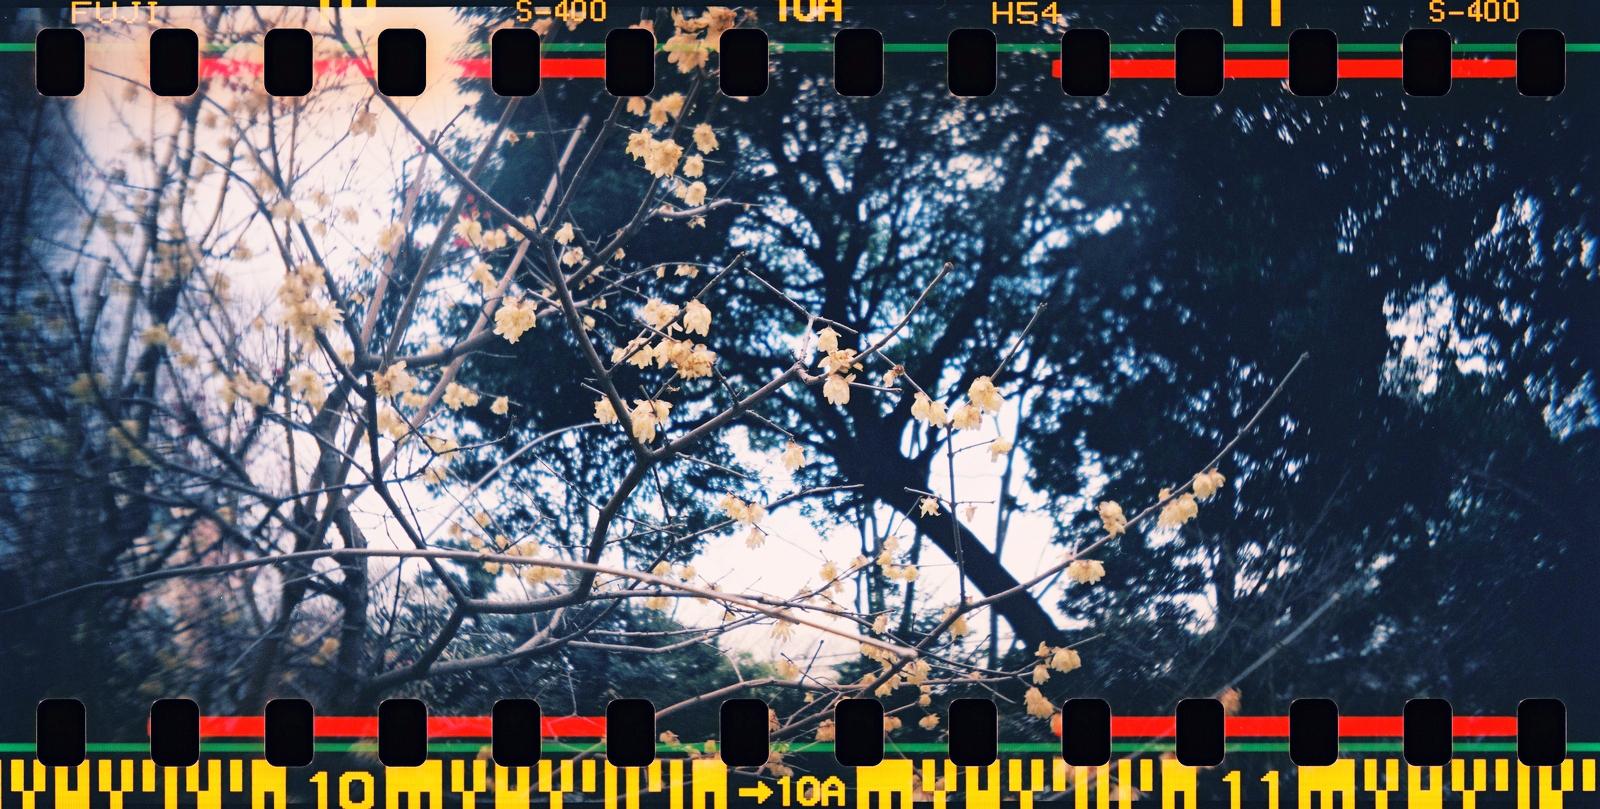 000006 Lomo Sprocket Rocket X Fujifilm X-TRA 400